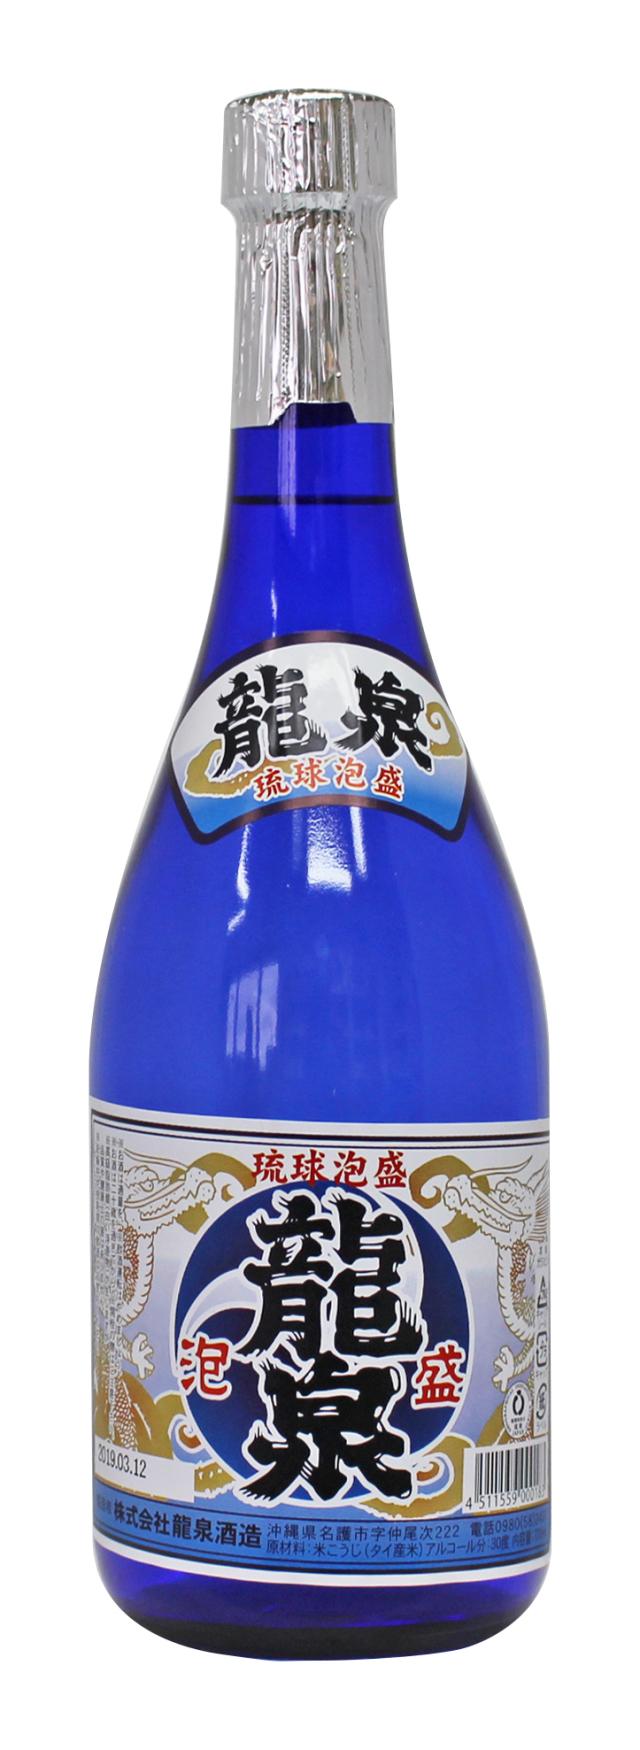 龍泉ブルー 30度 720ml